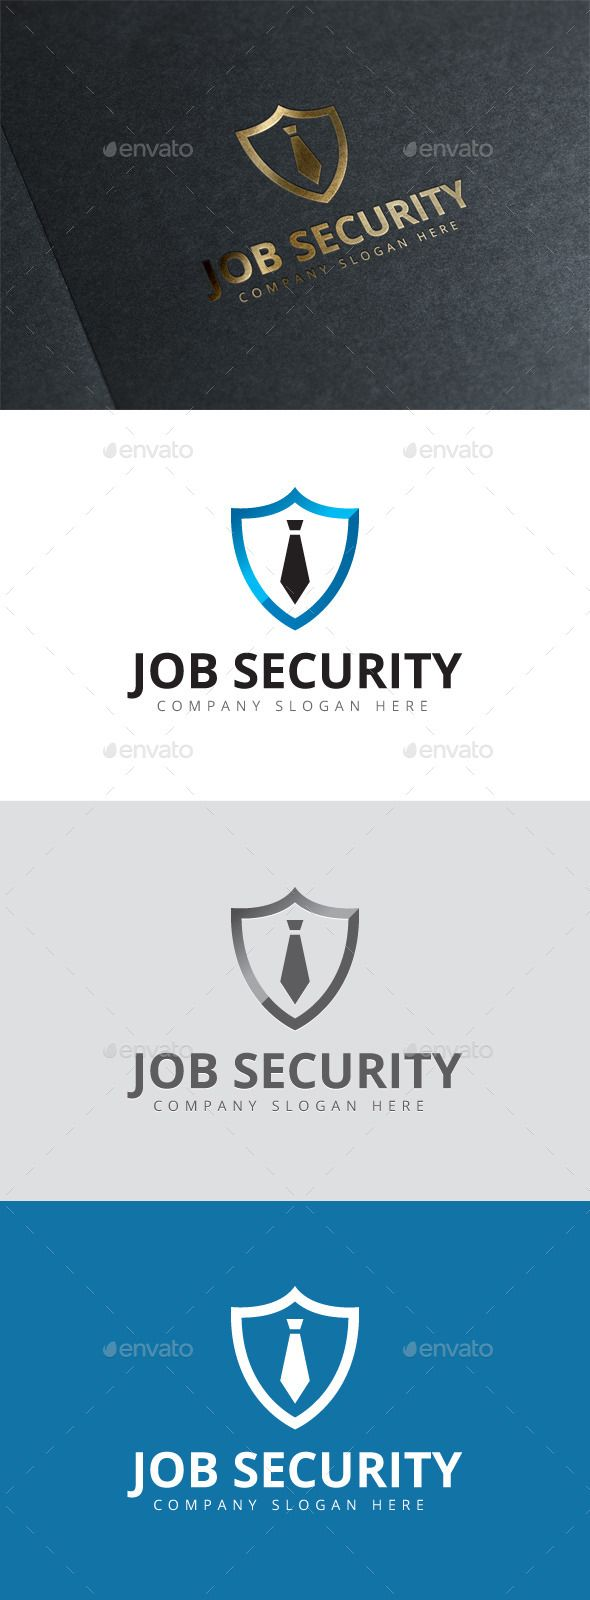 job security logo logos job security and wells job security this says it all a job offering security as long as you